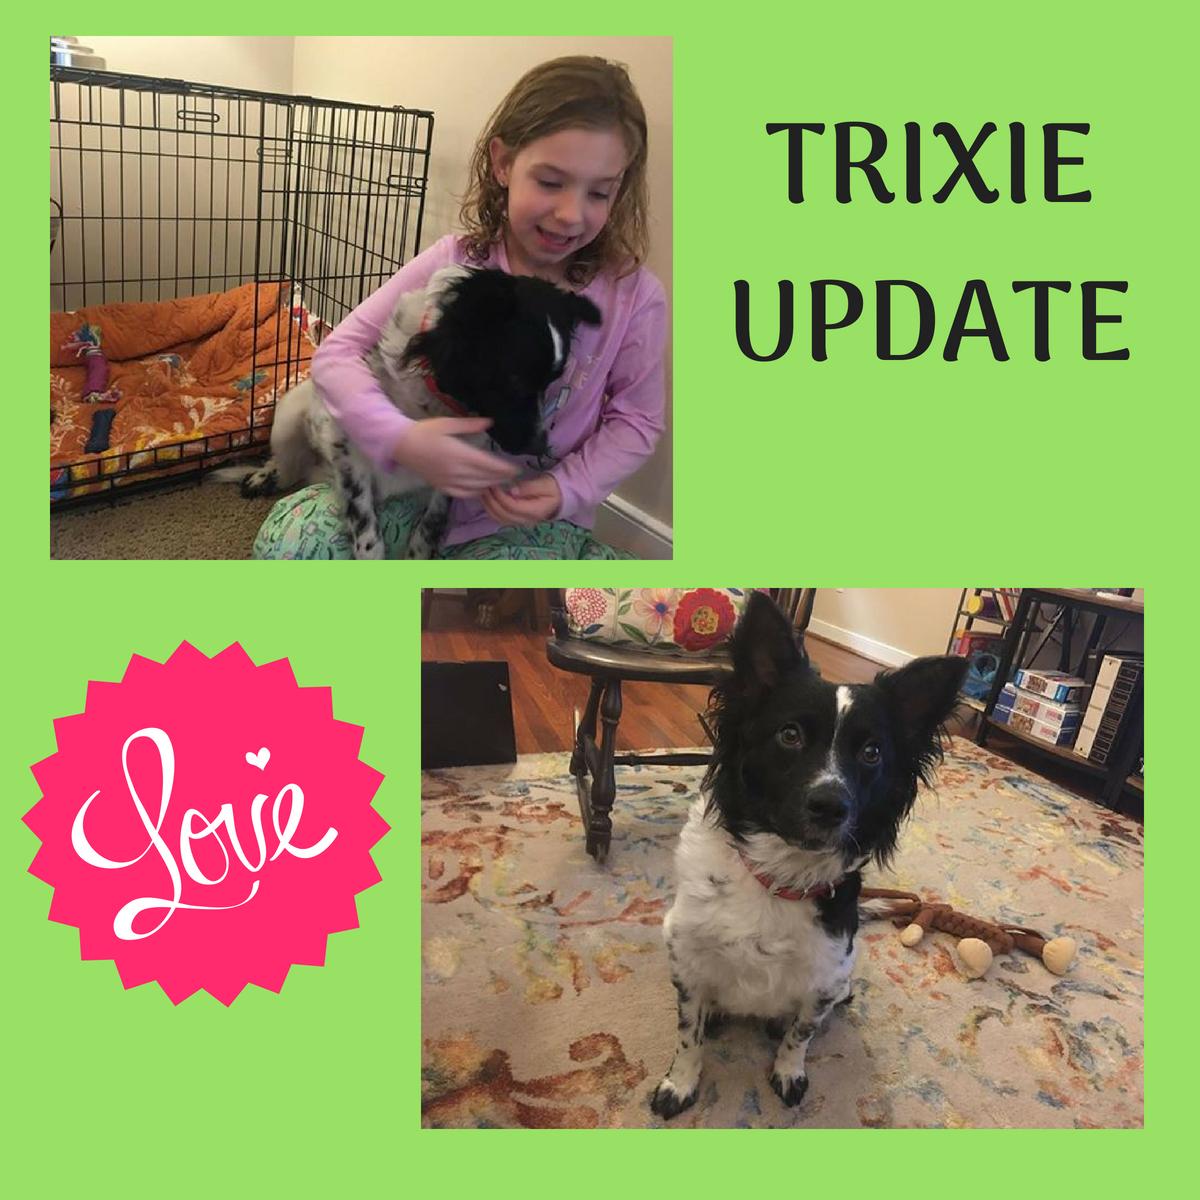 Trixie.